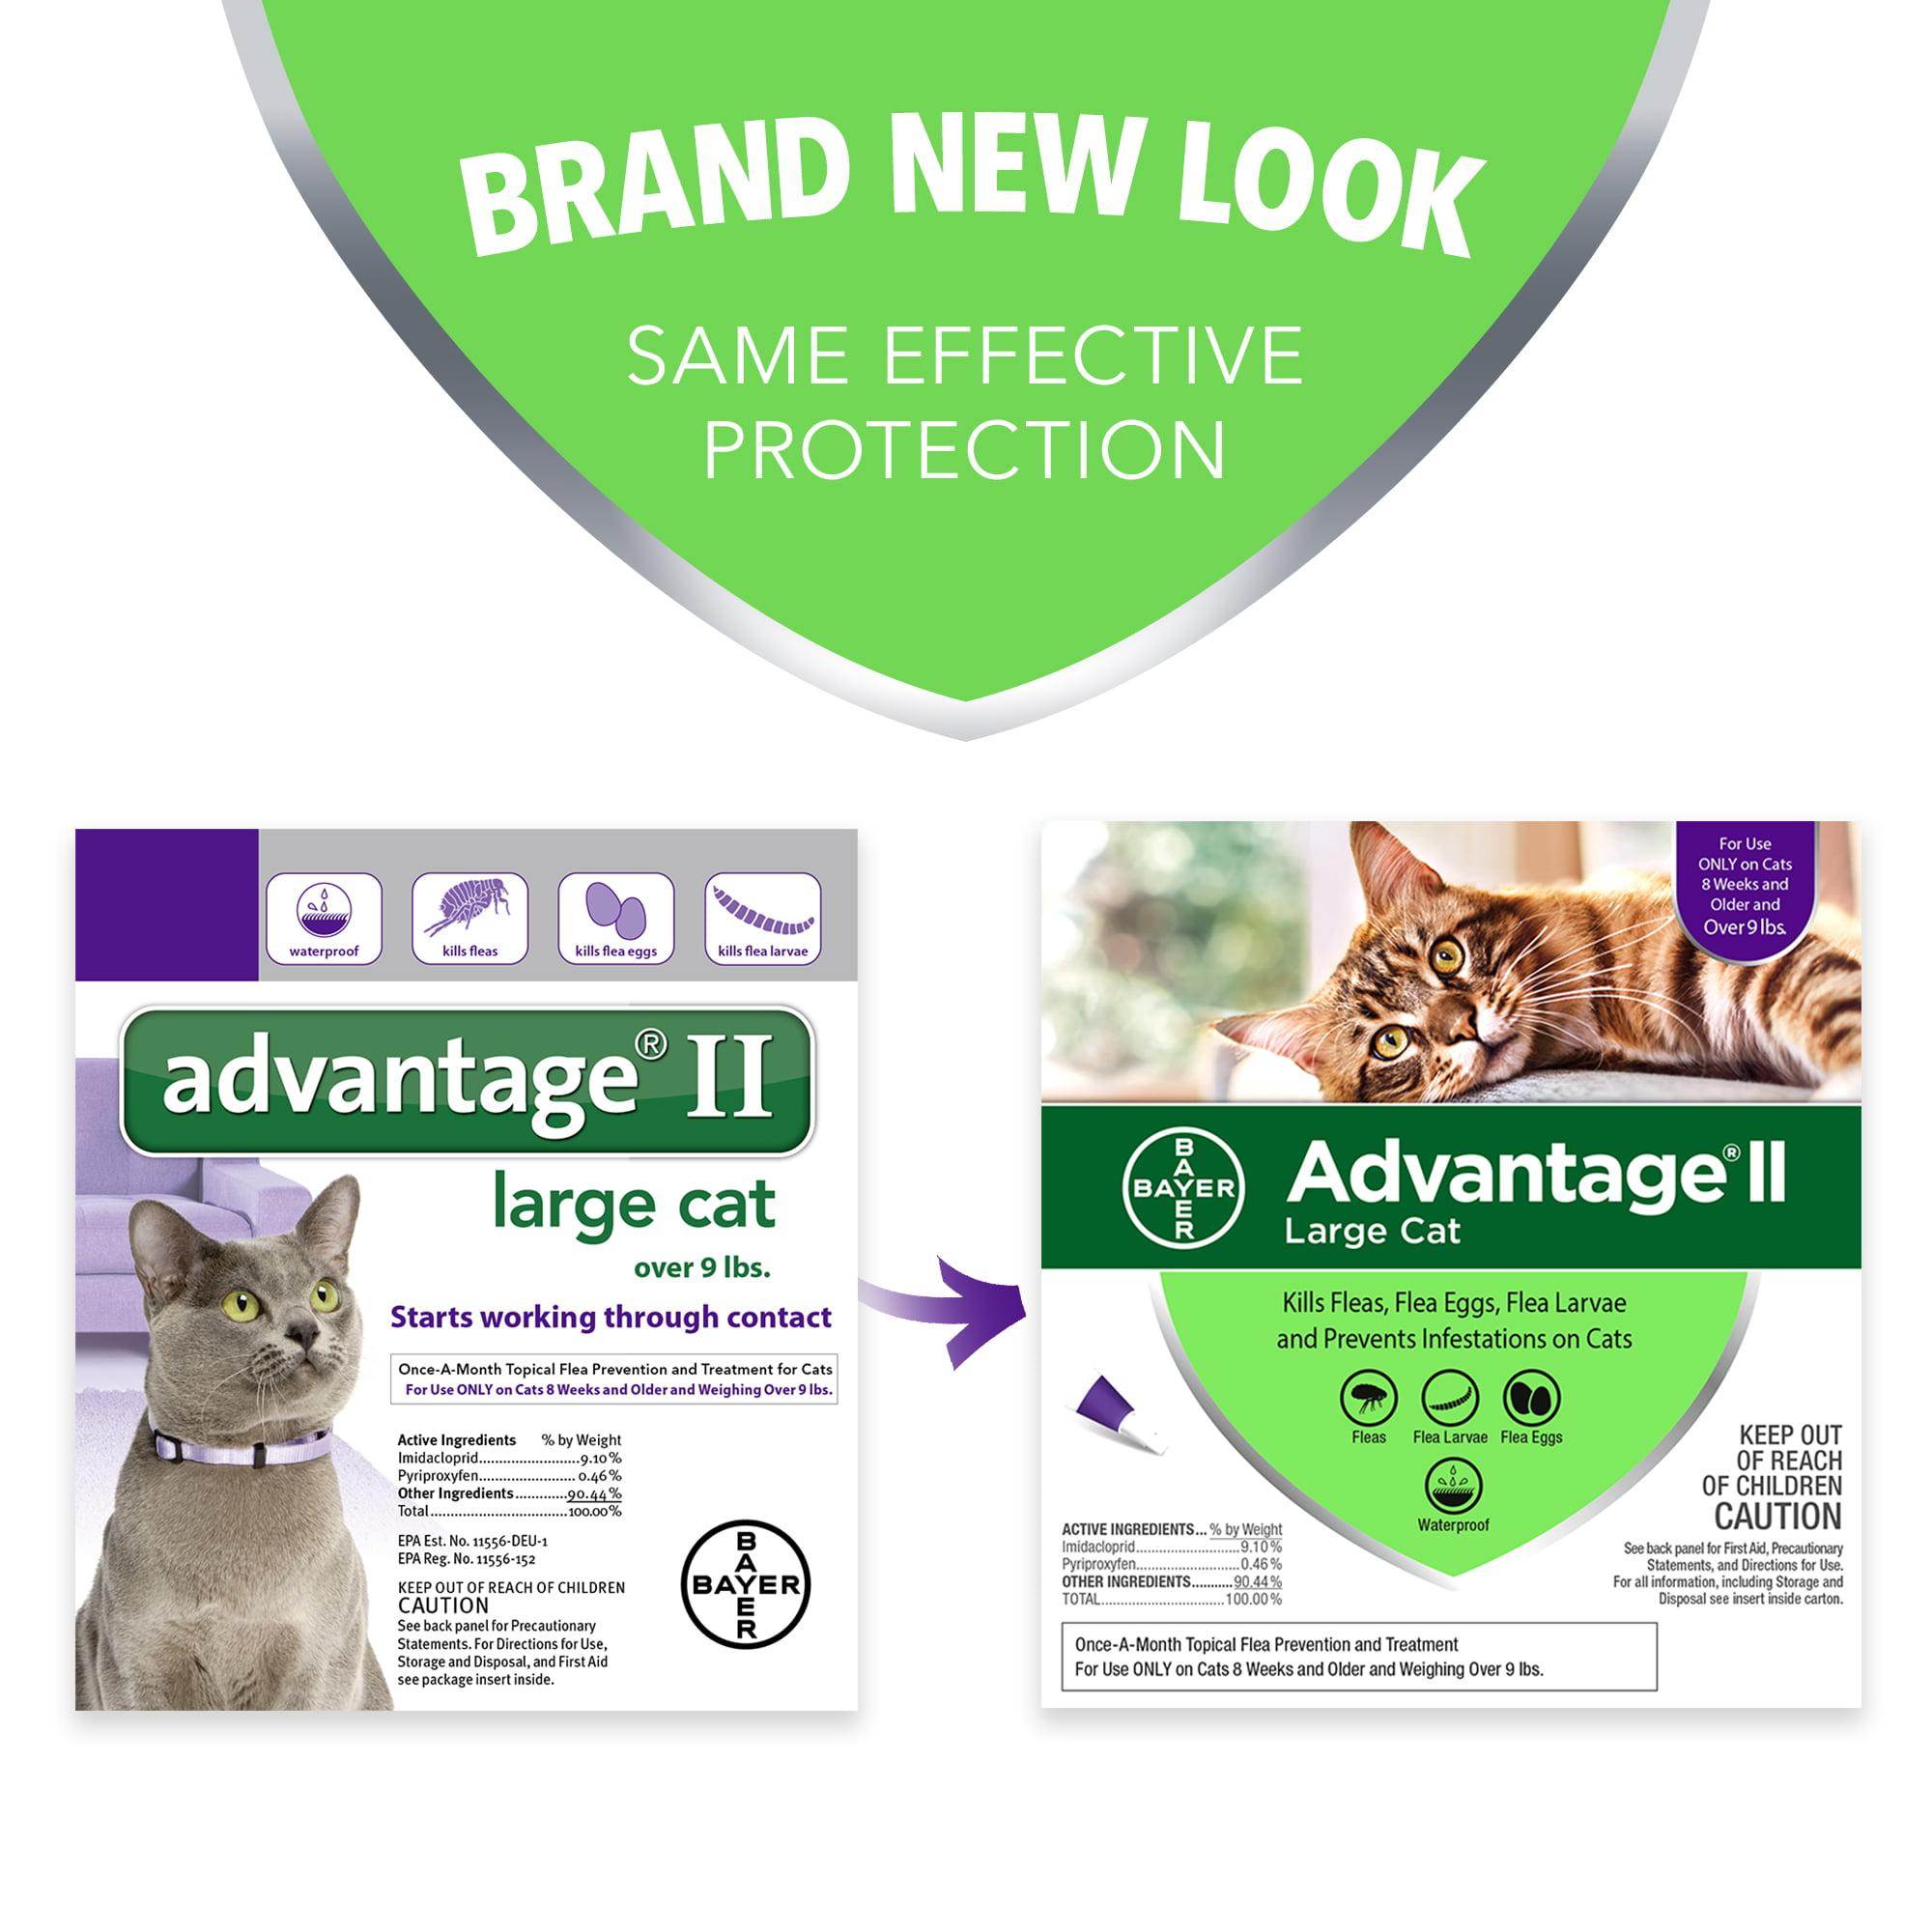 ae530f0af99a Advantage II Flea Treatment for Large Cats